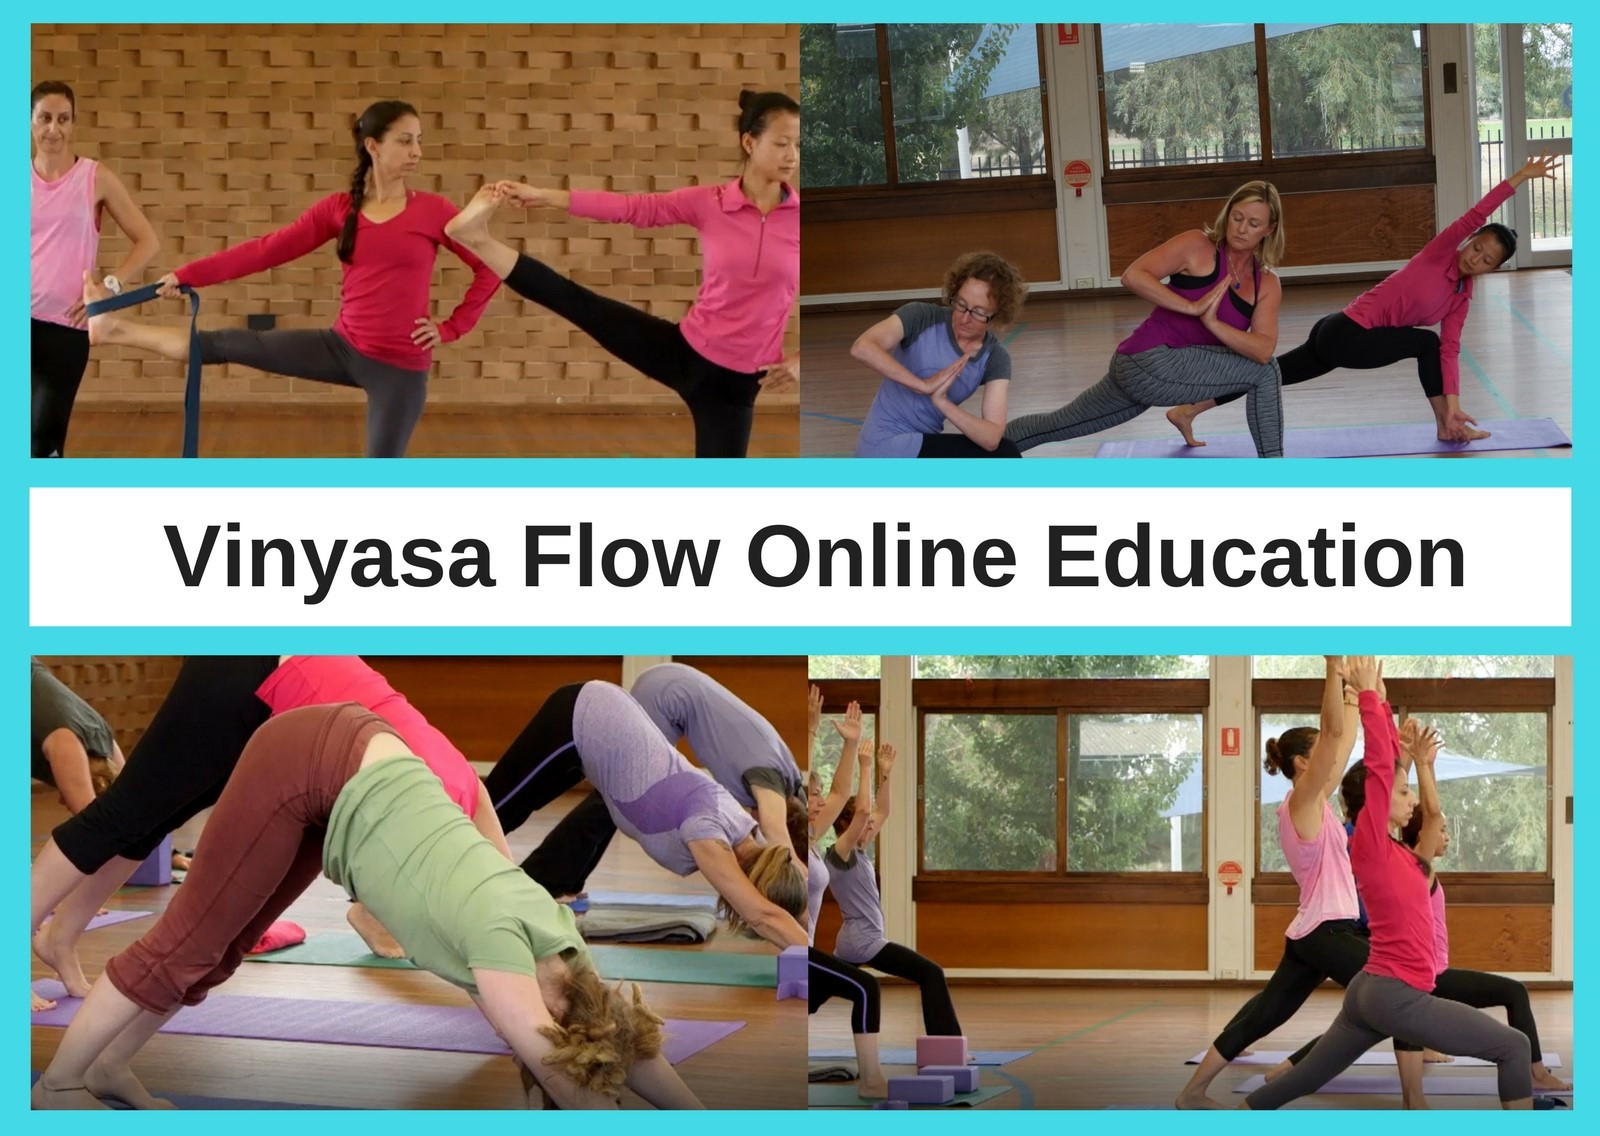 Vinyasa Flow Online Yoga CEC Course - Yoga Trinity